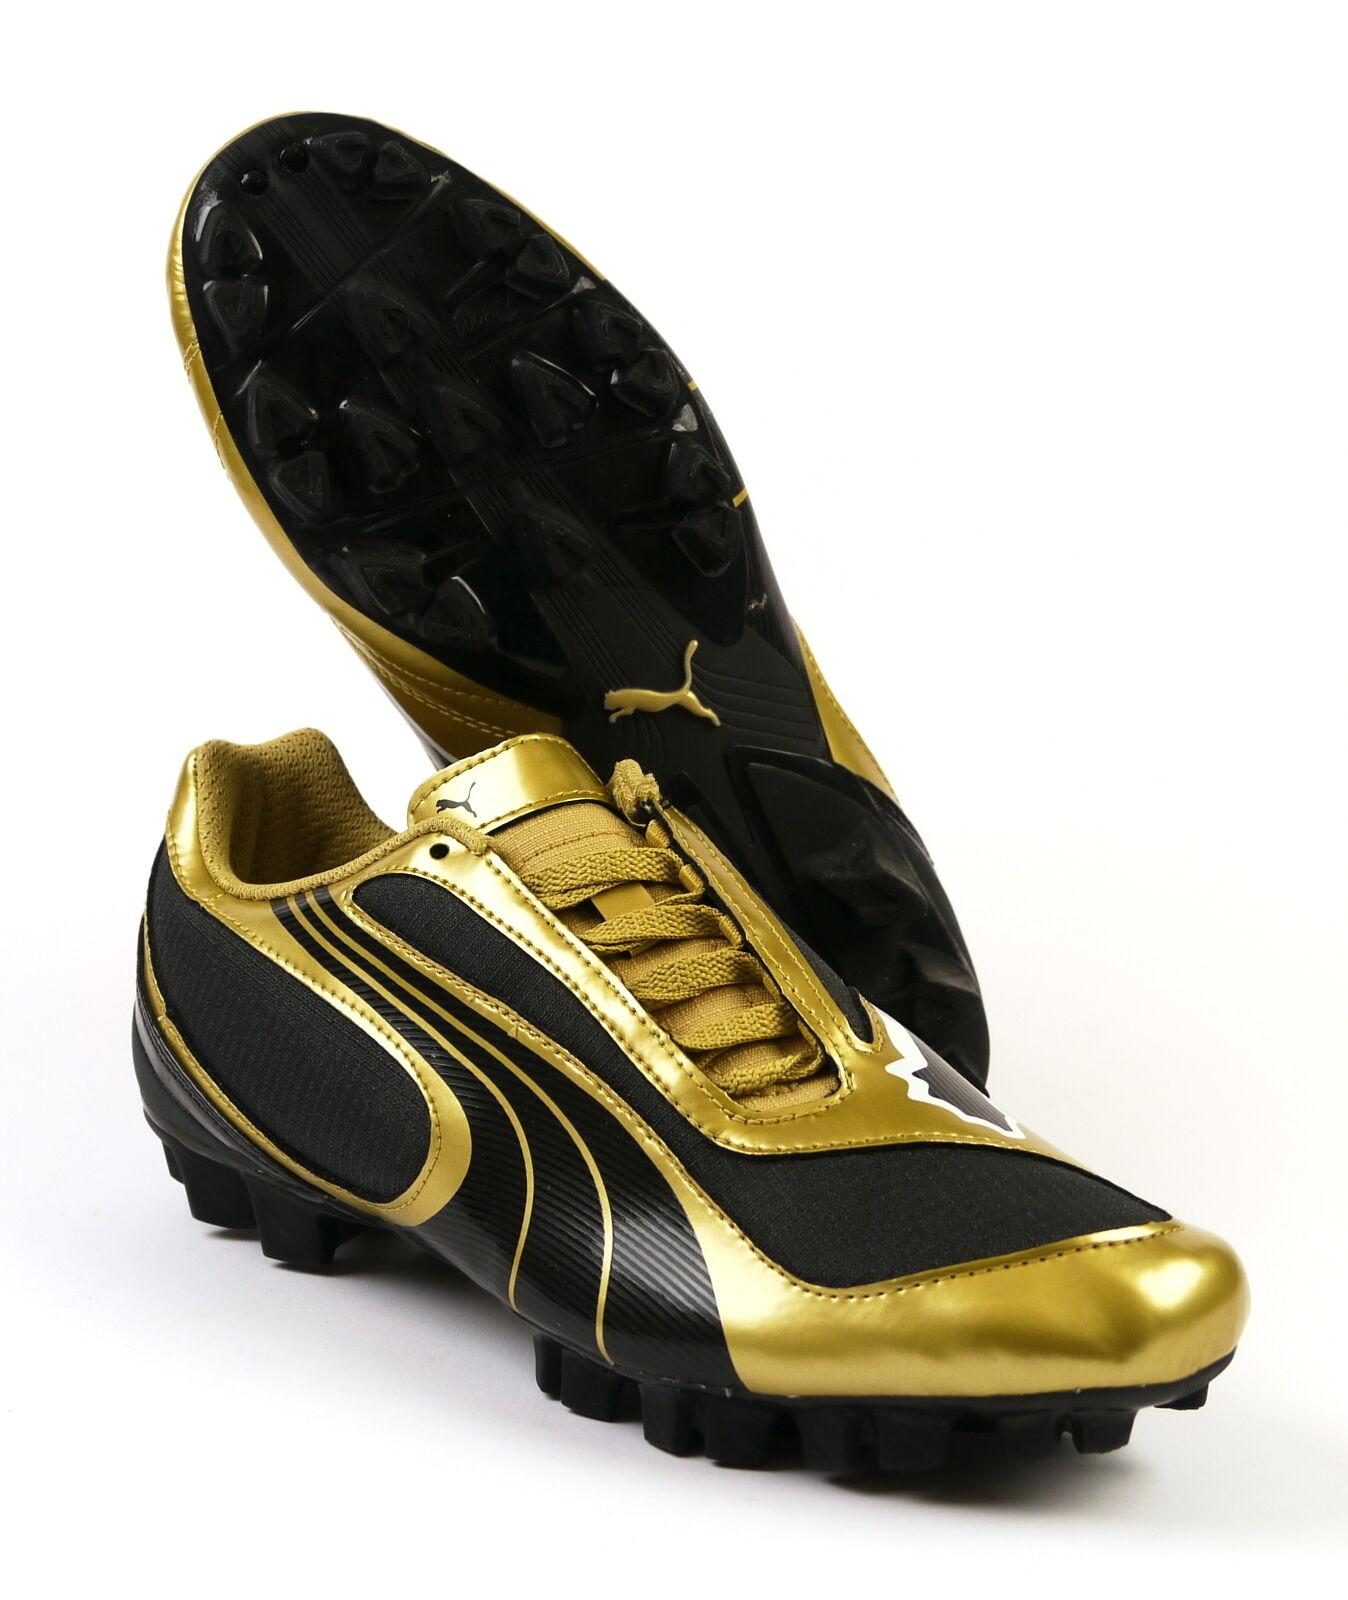 Puma v5.08 SL GCR HG 101752 05 Size 40 - 46 Football Boots NIP